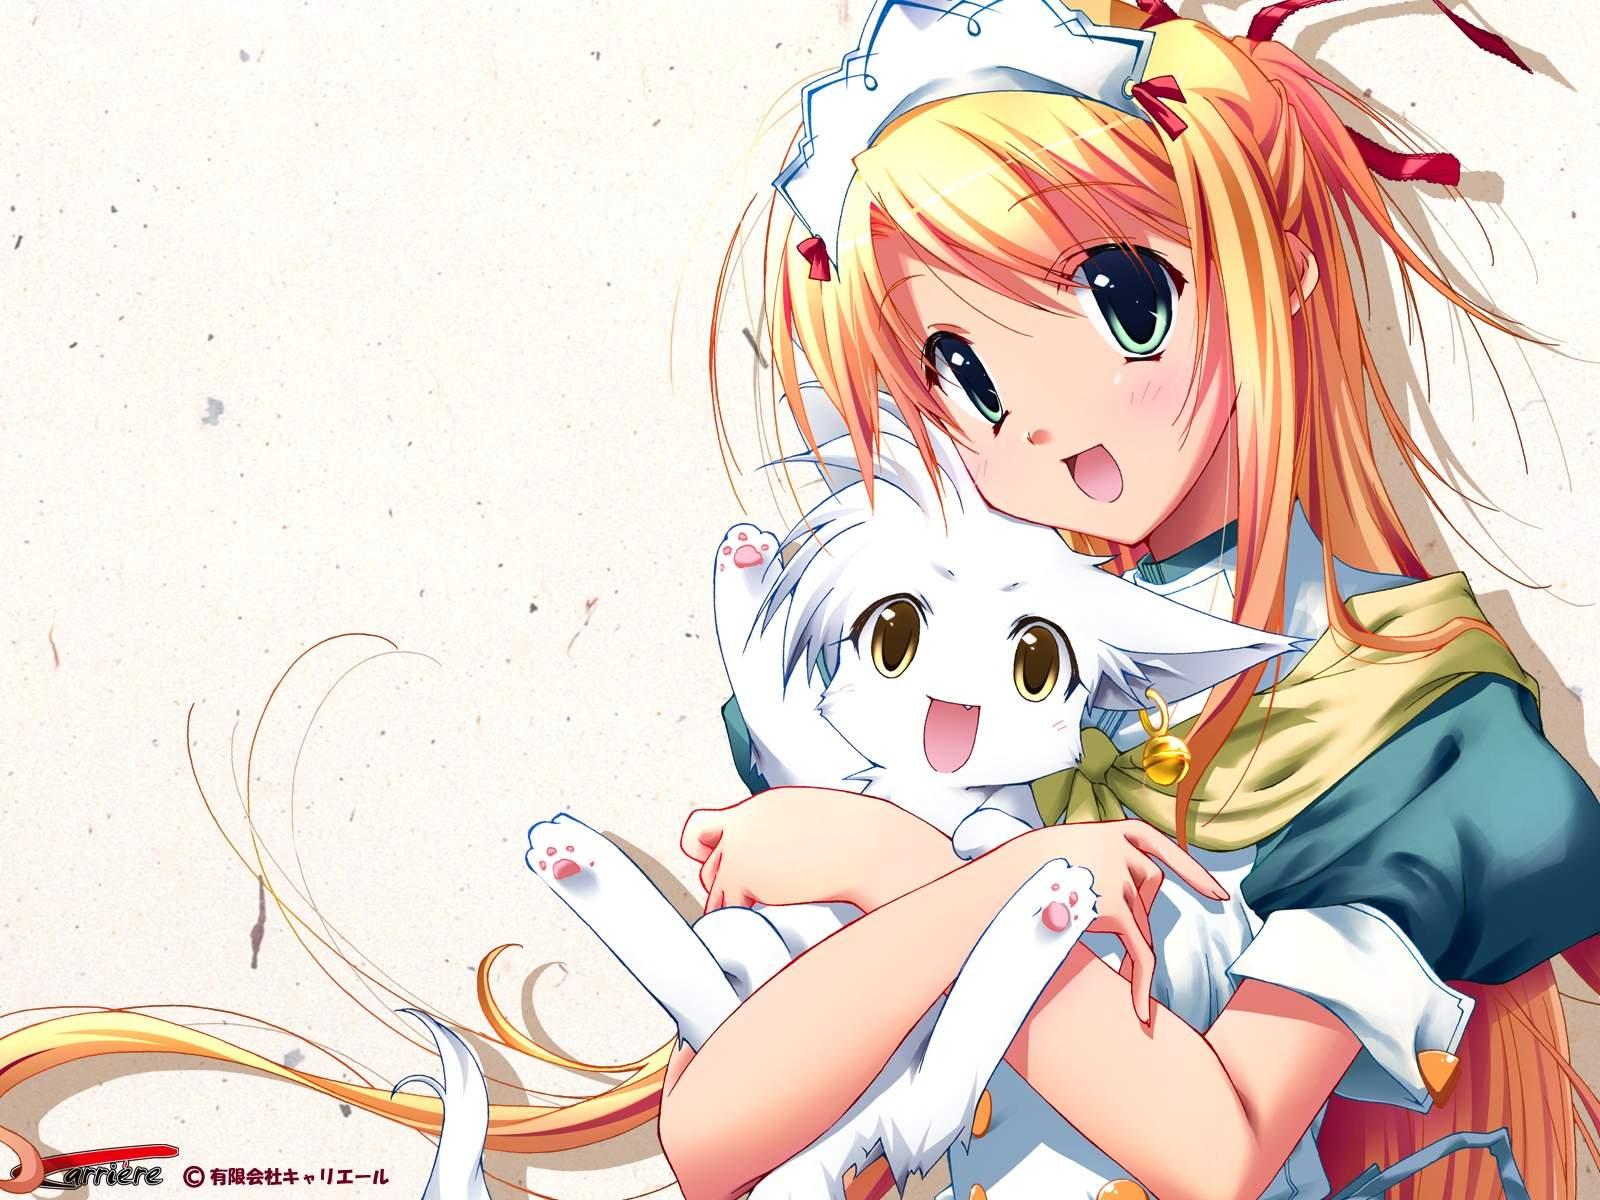 http://2.bp.blogspot.com/-6M34WLZunKM/TfZ3bDbZ6wI/AAAAAAAAAGQ/yuQy61hzaP8/s1600/anime_wallpaper+%25281%2529.jpg